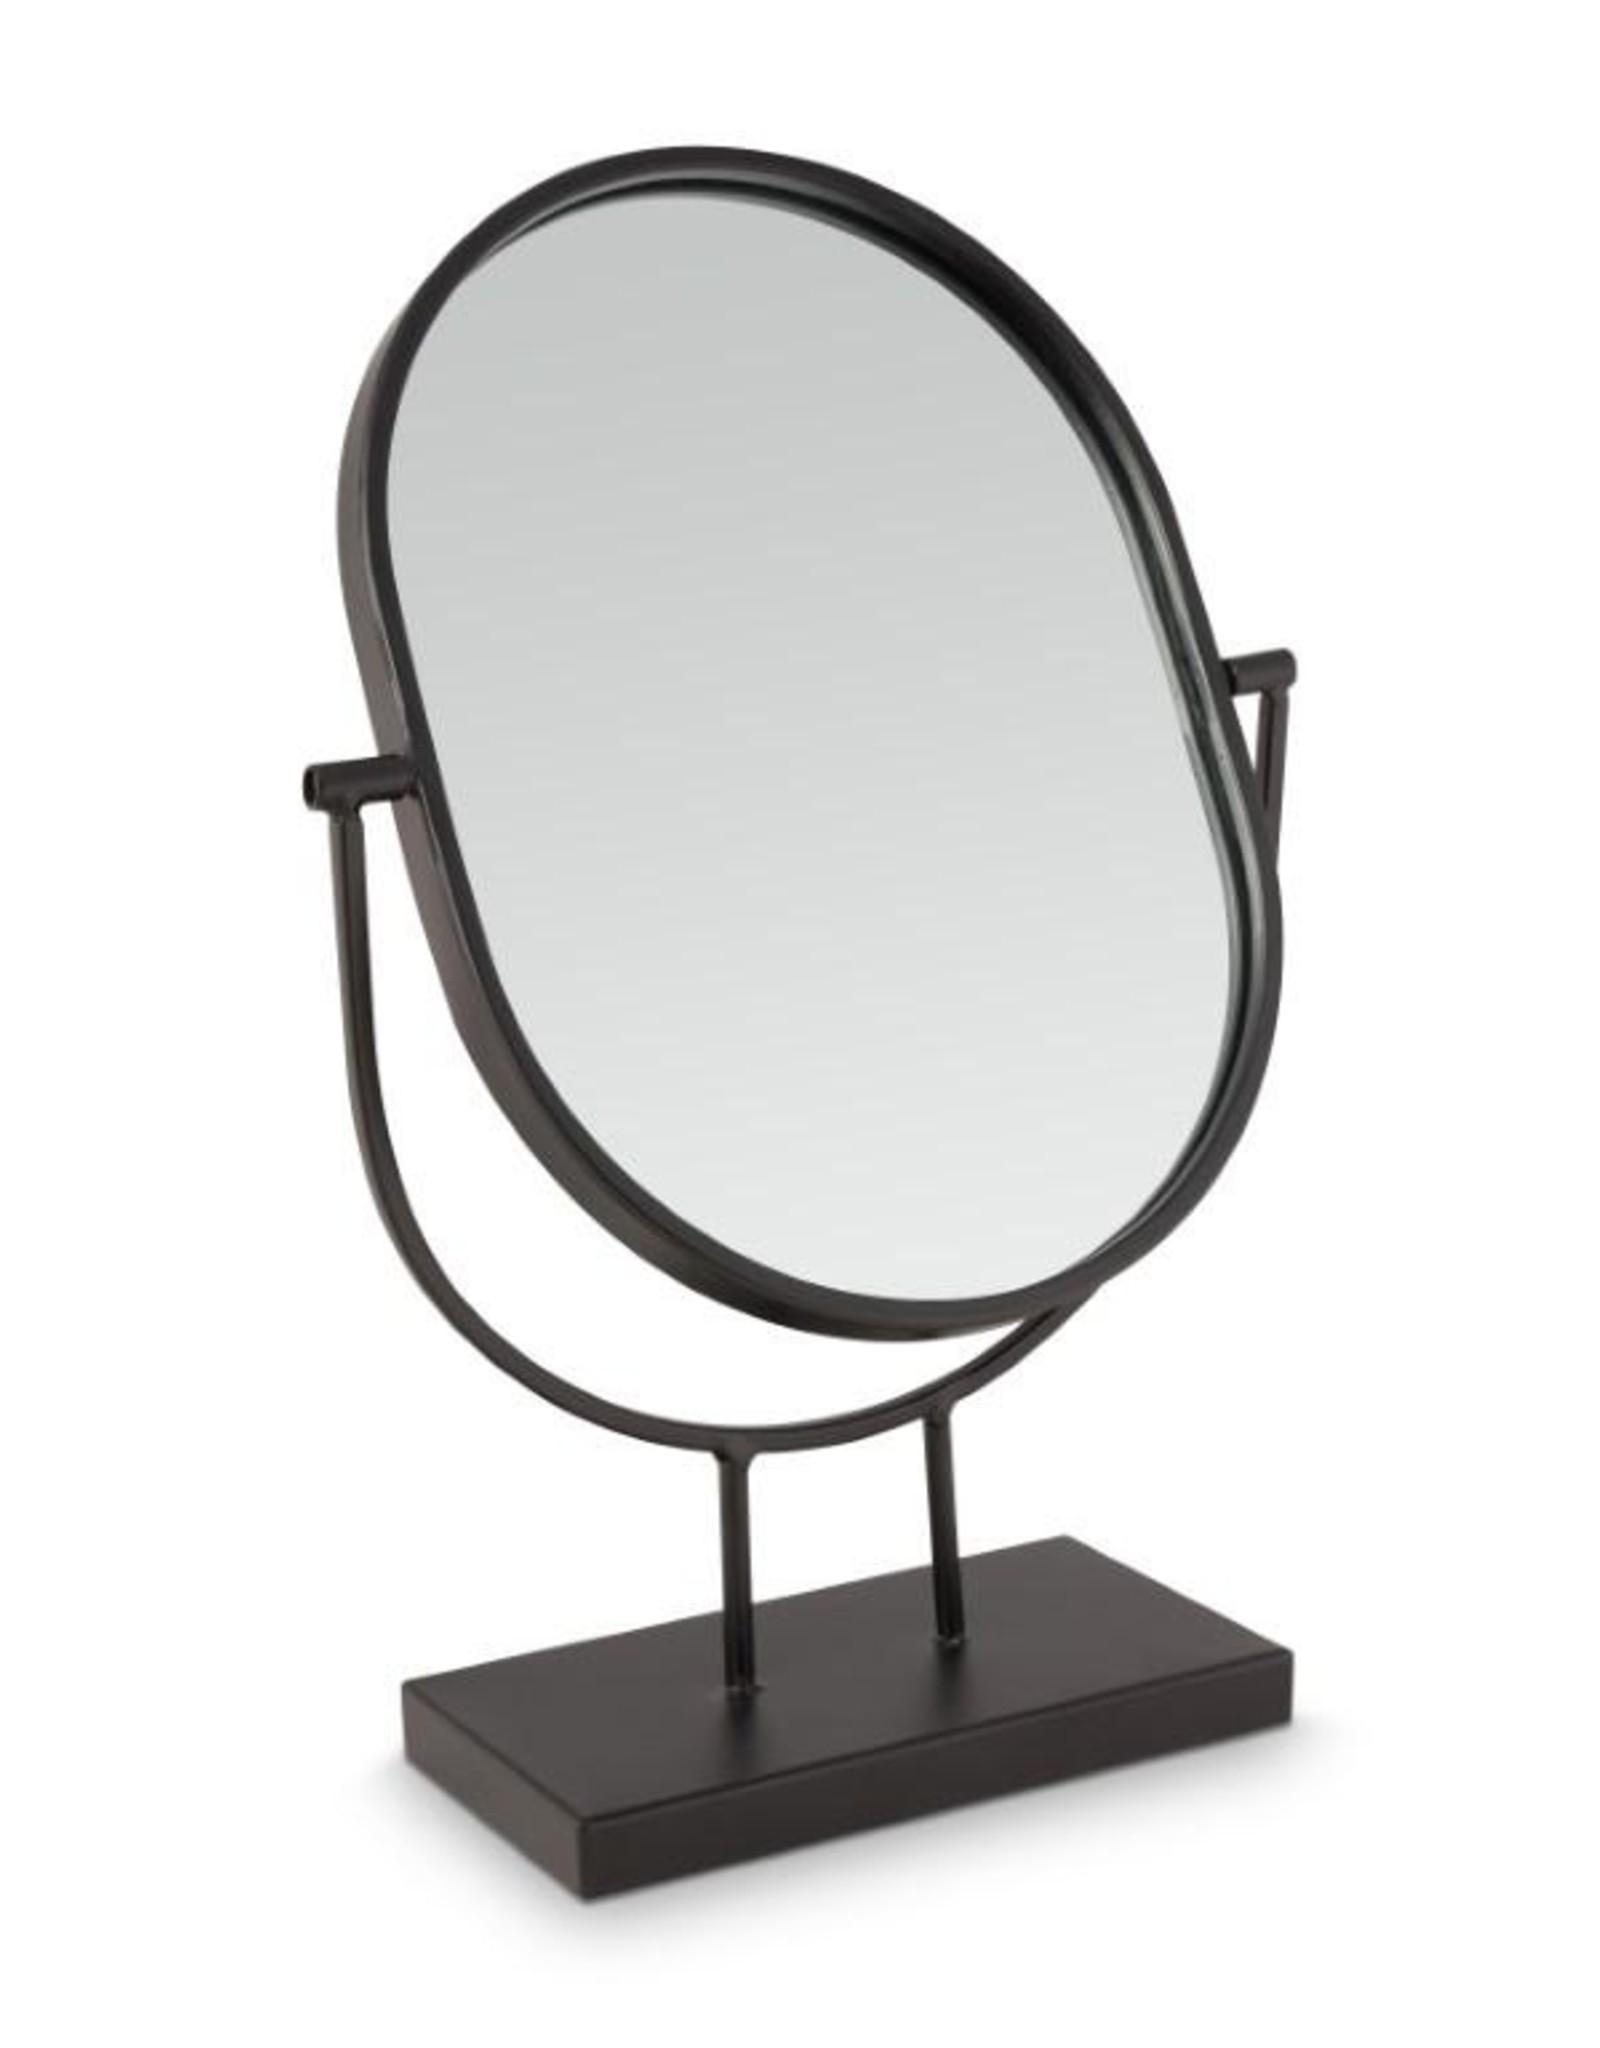 spiegel ovaal zwart staander